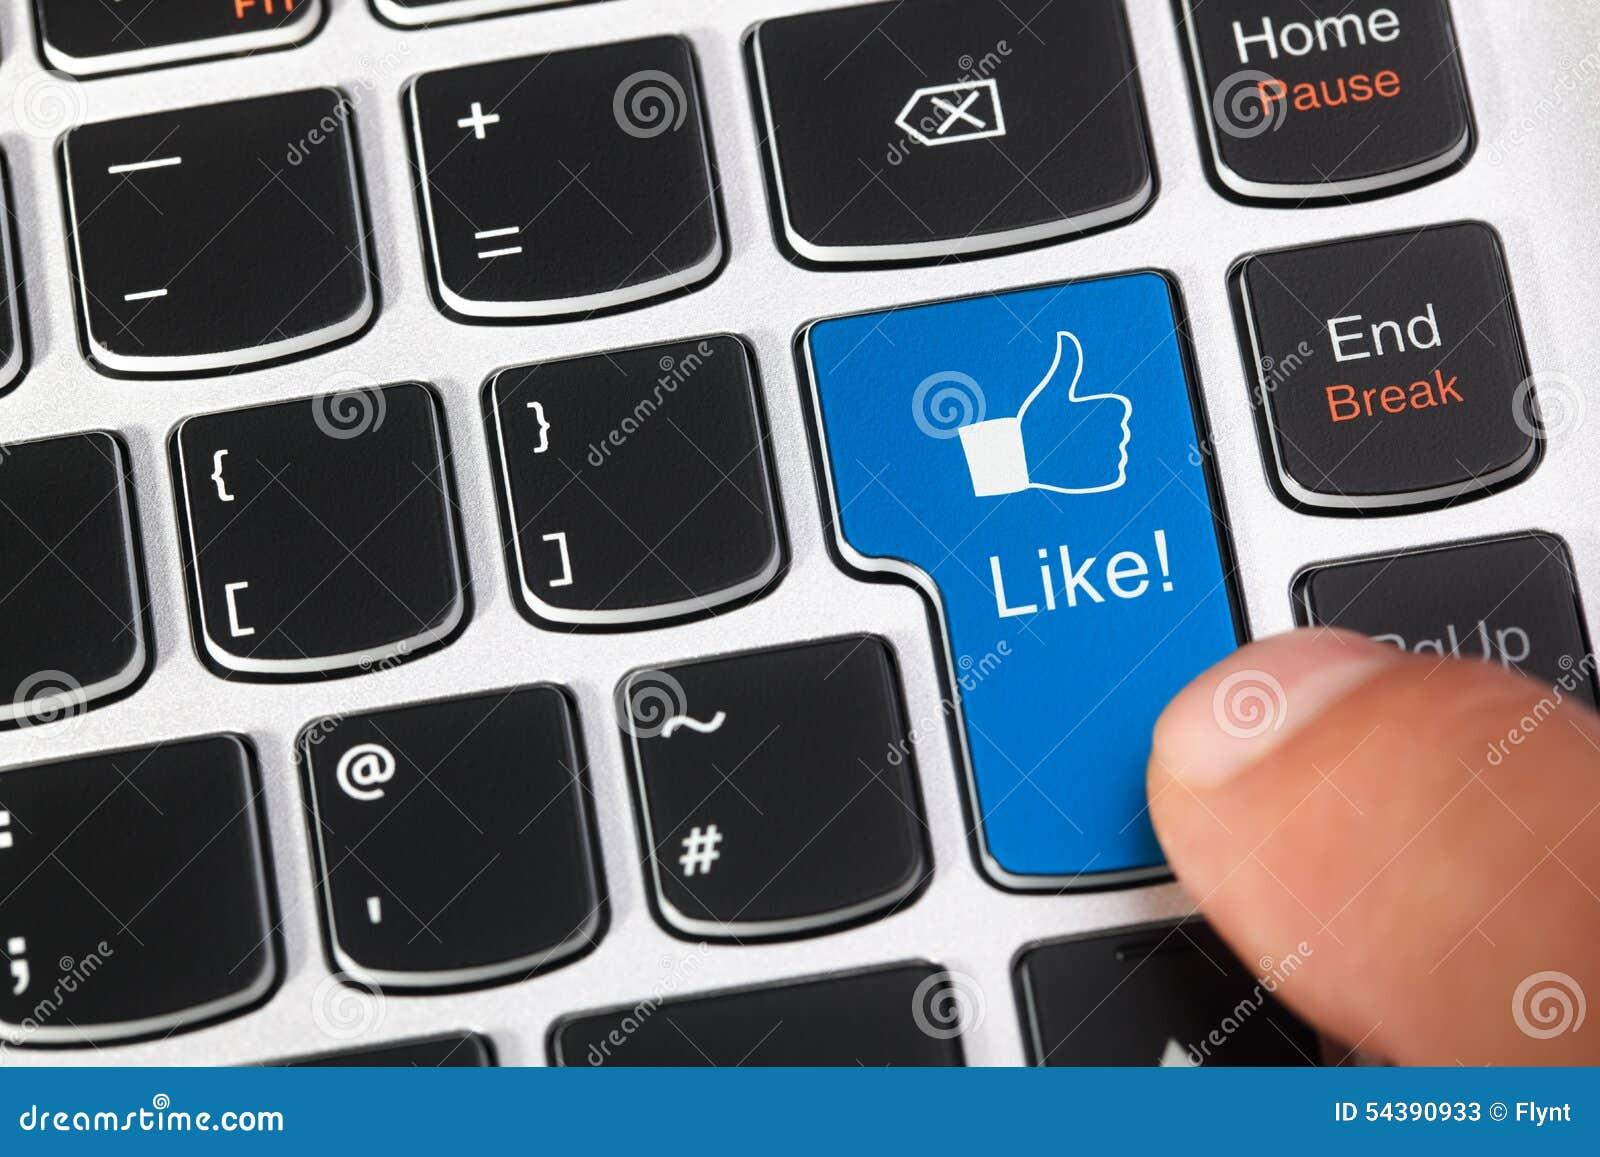 Blauwe toetsenbordsleutel met gelijkaardige knoop en duimen op pictogram